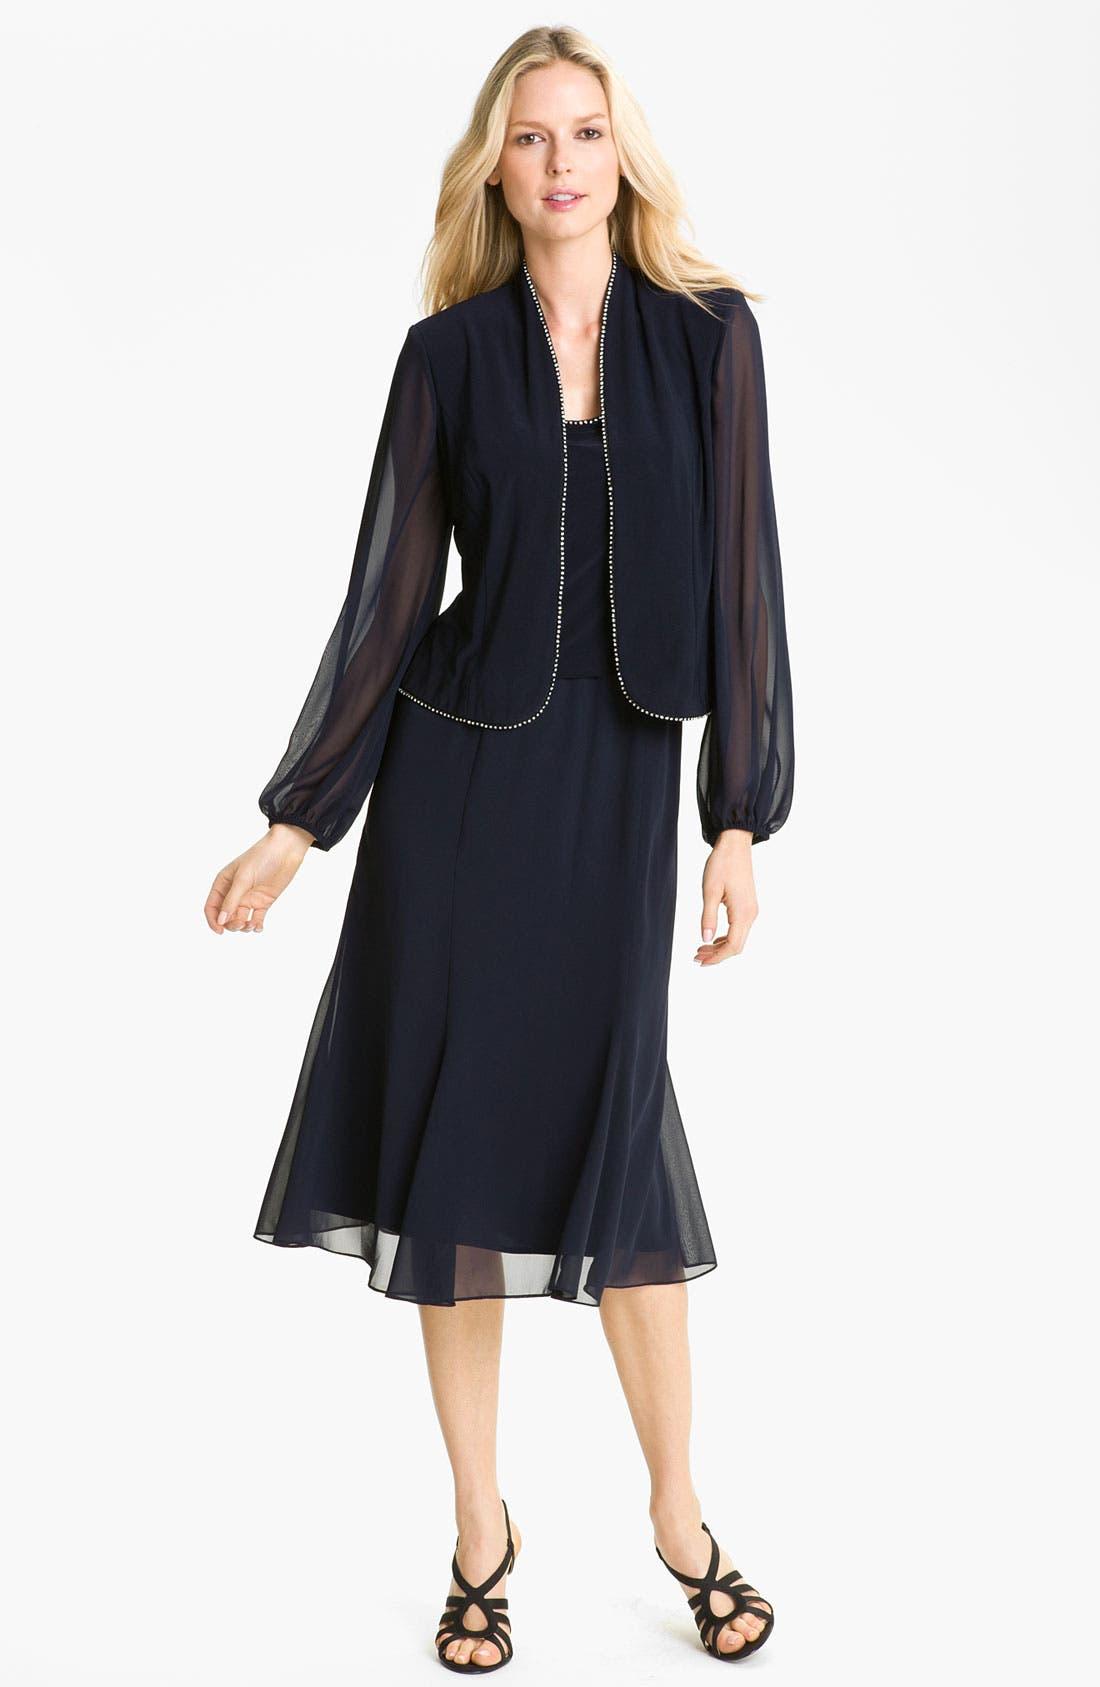 Main Image - Alex Evenings Rhinestone Trim Mix Media Dress & Jacket